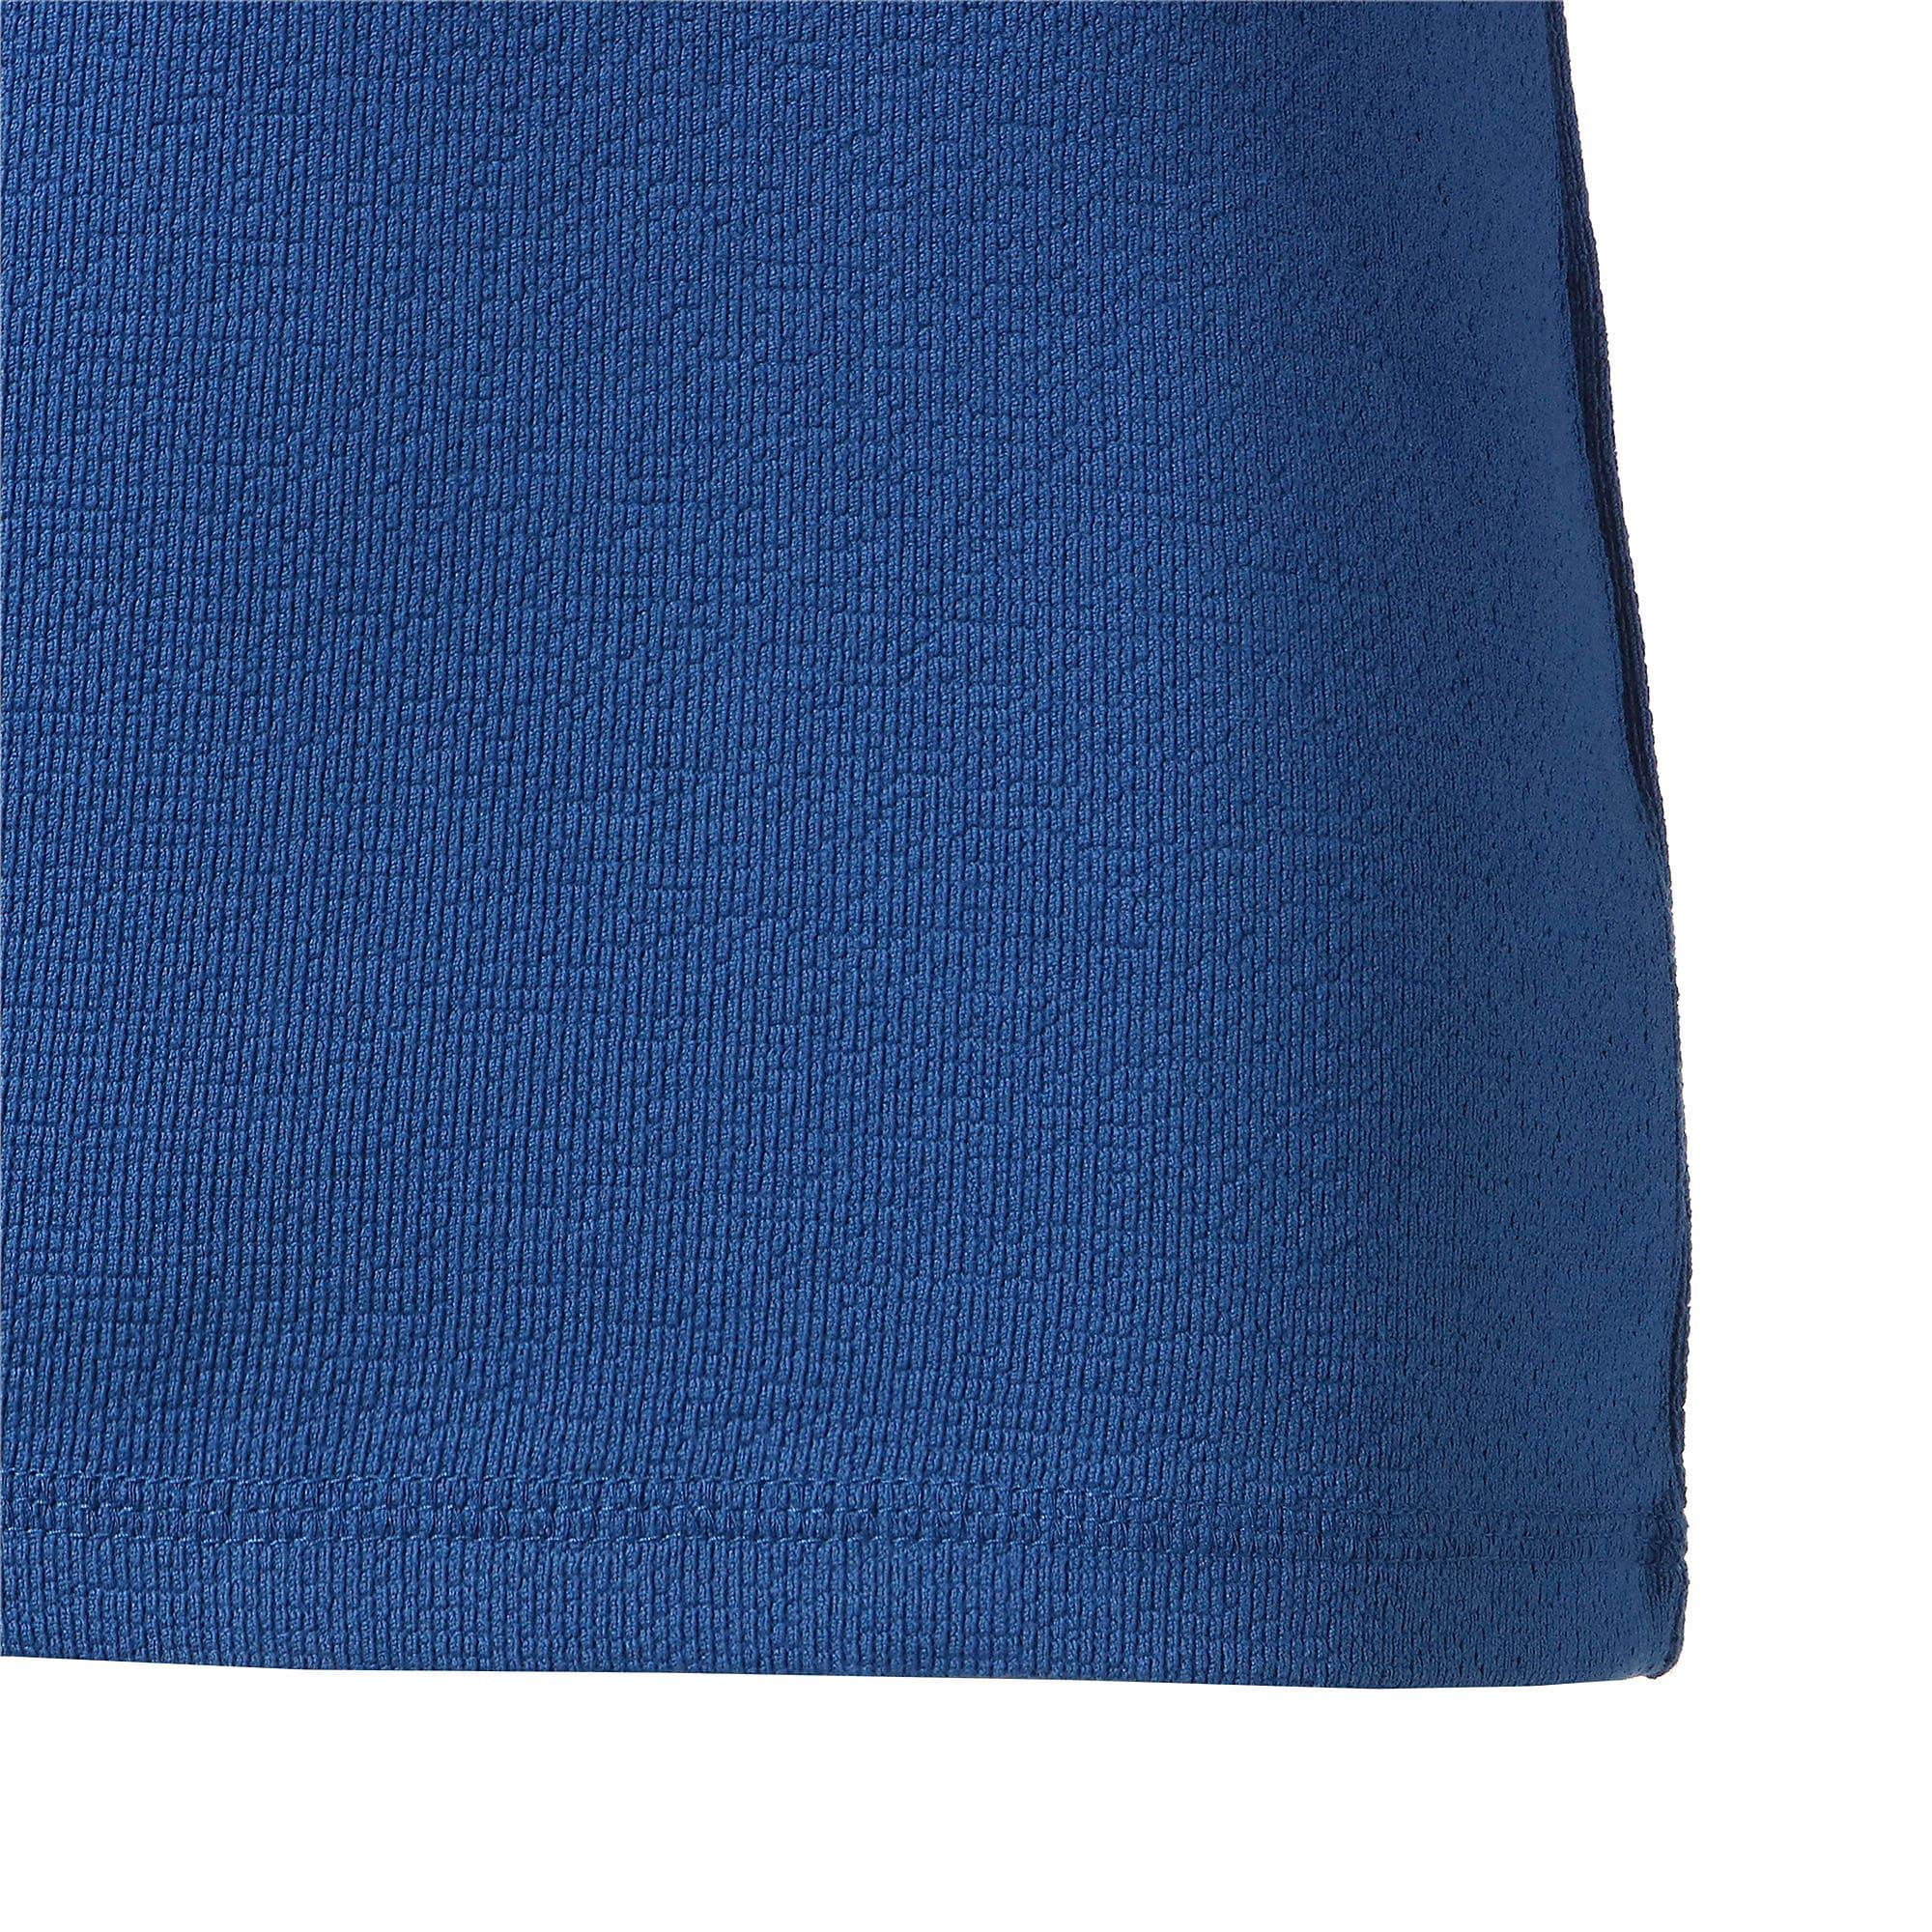 Thumbnail 6 of PUMA x TYAKASHA Tシャツ, Galaxy Blue, medium-JPN